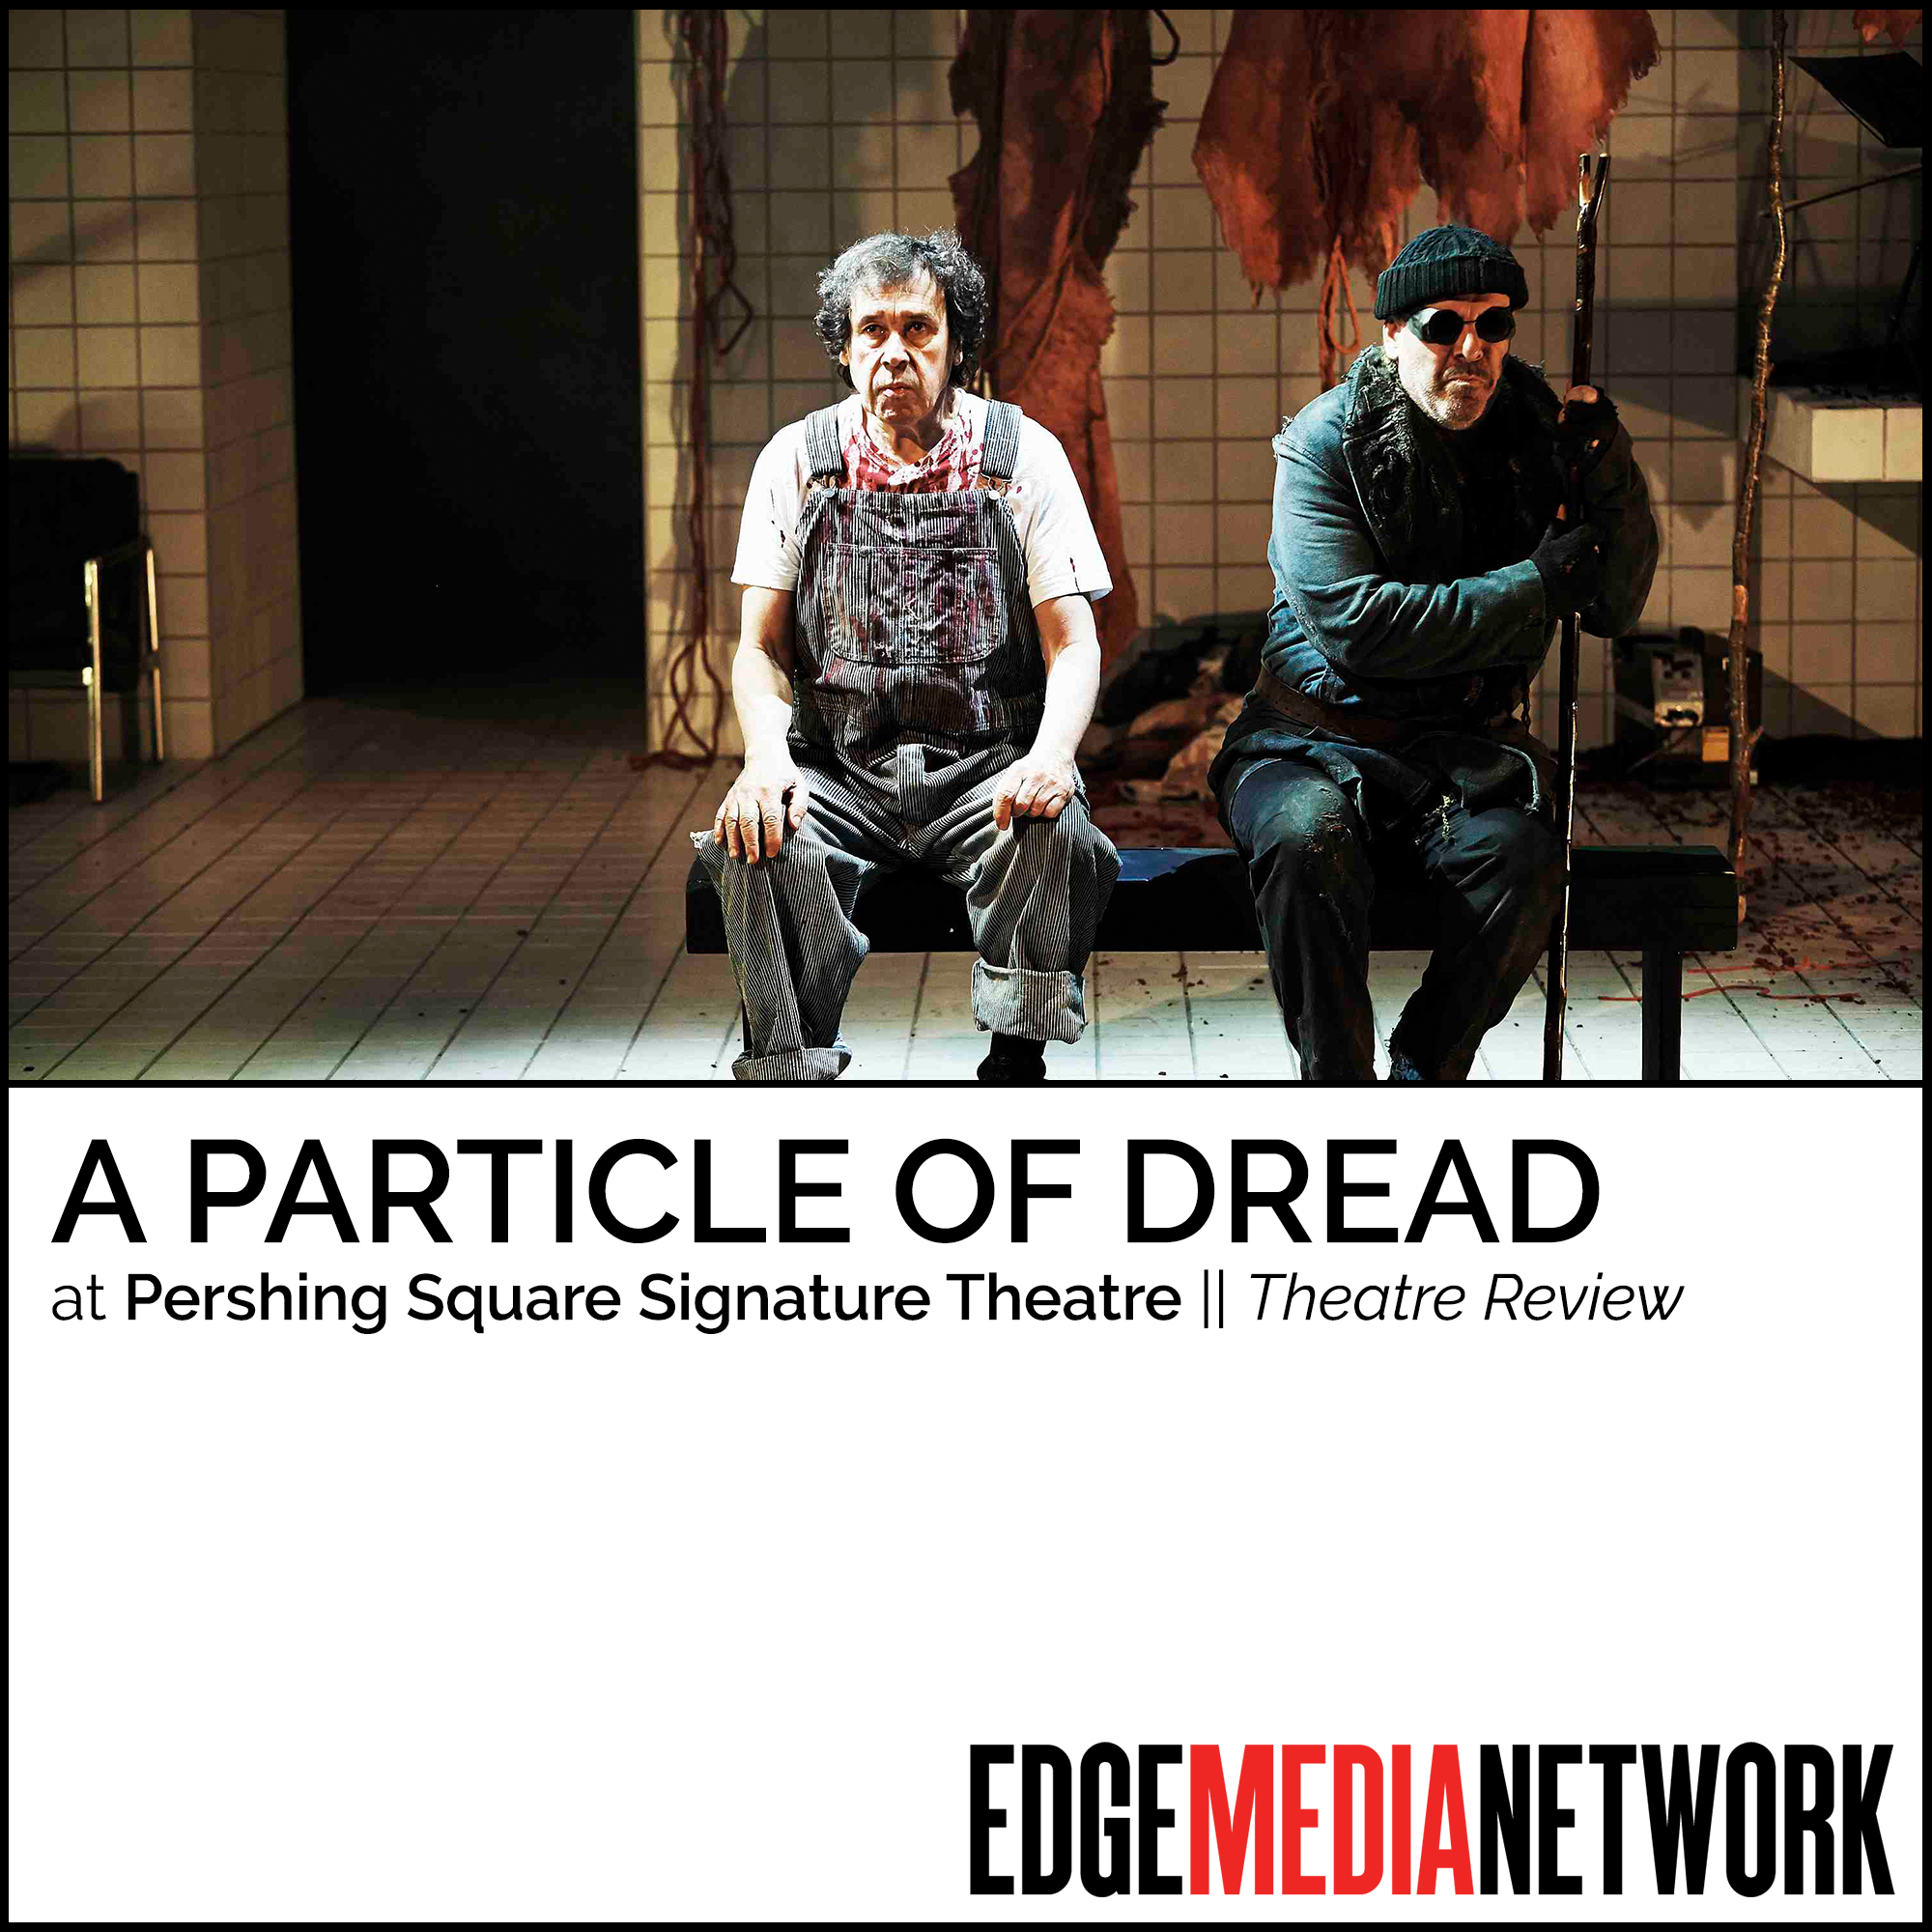 A Particle of Dread TILE 1.jpg